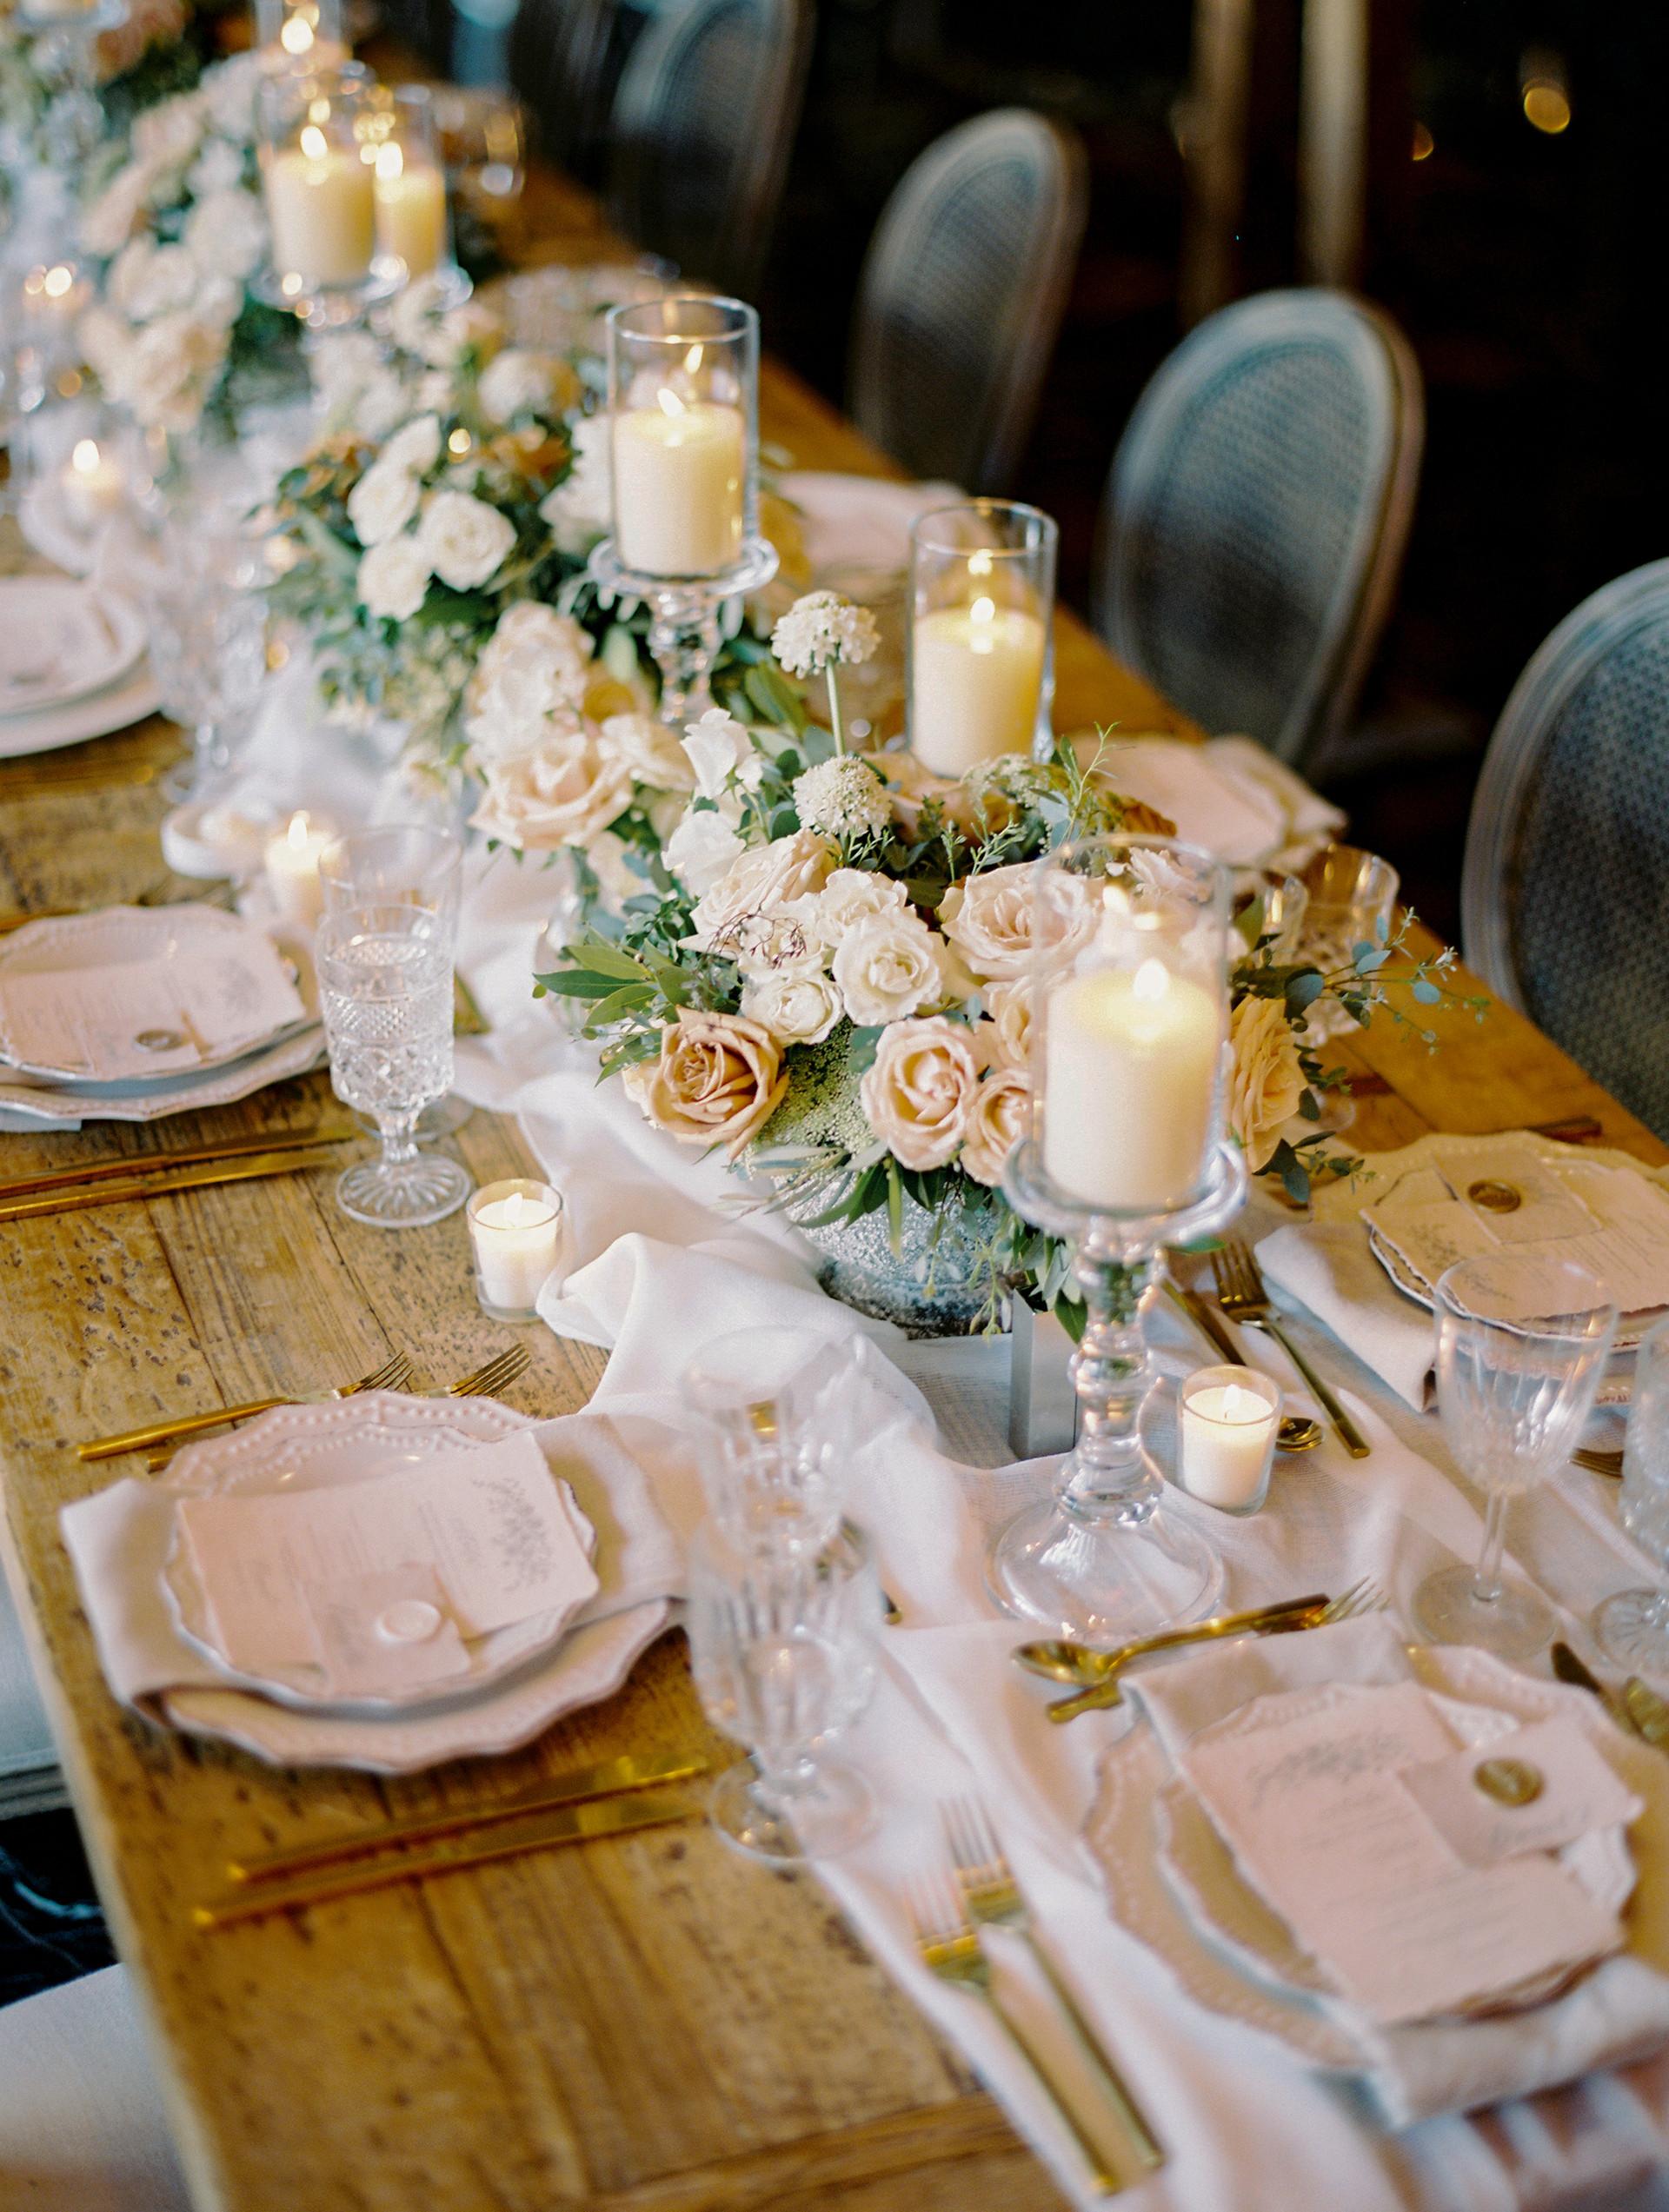 White, cream, and nude wedding reception. Photo: Gaby Jeter